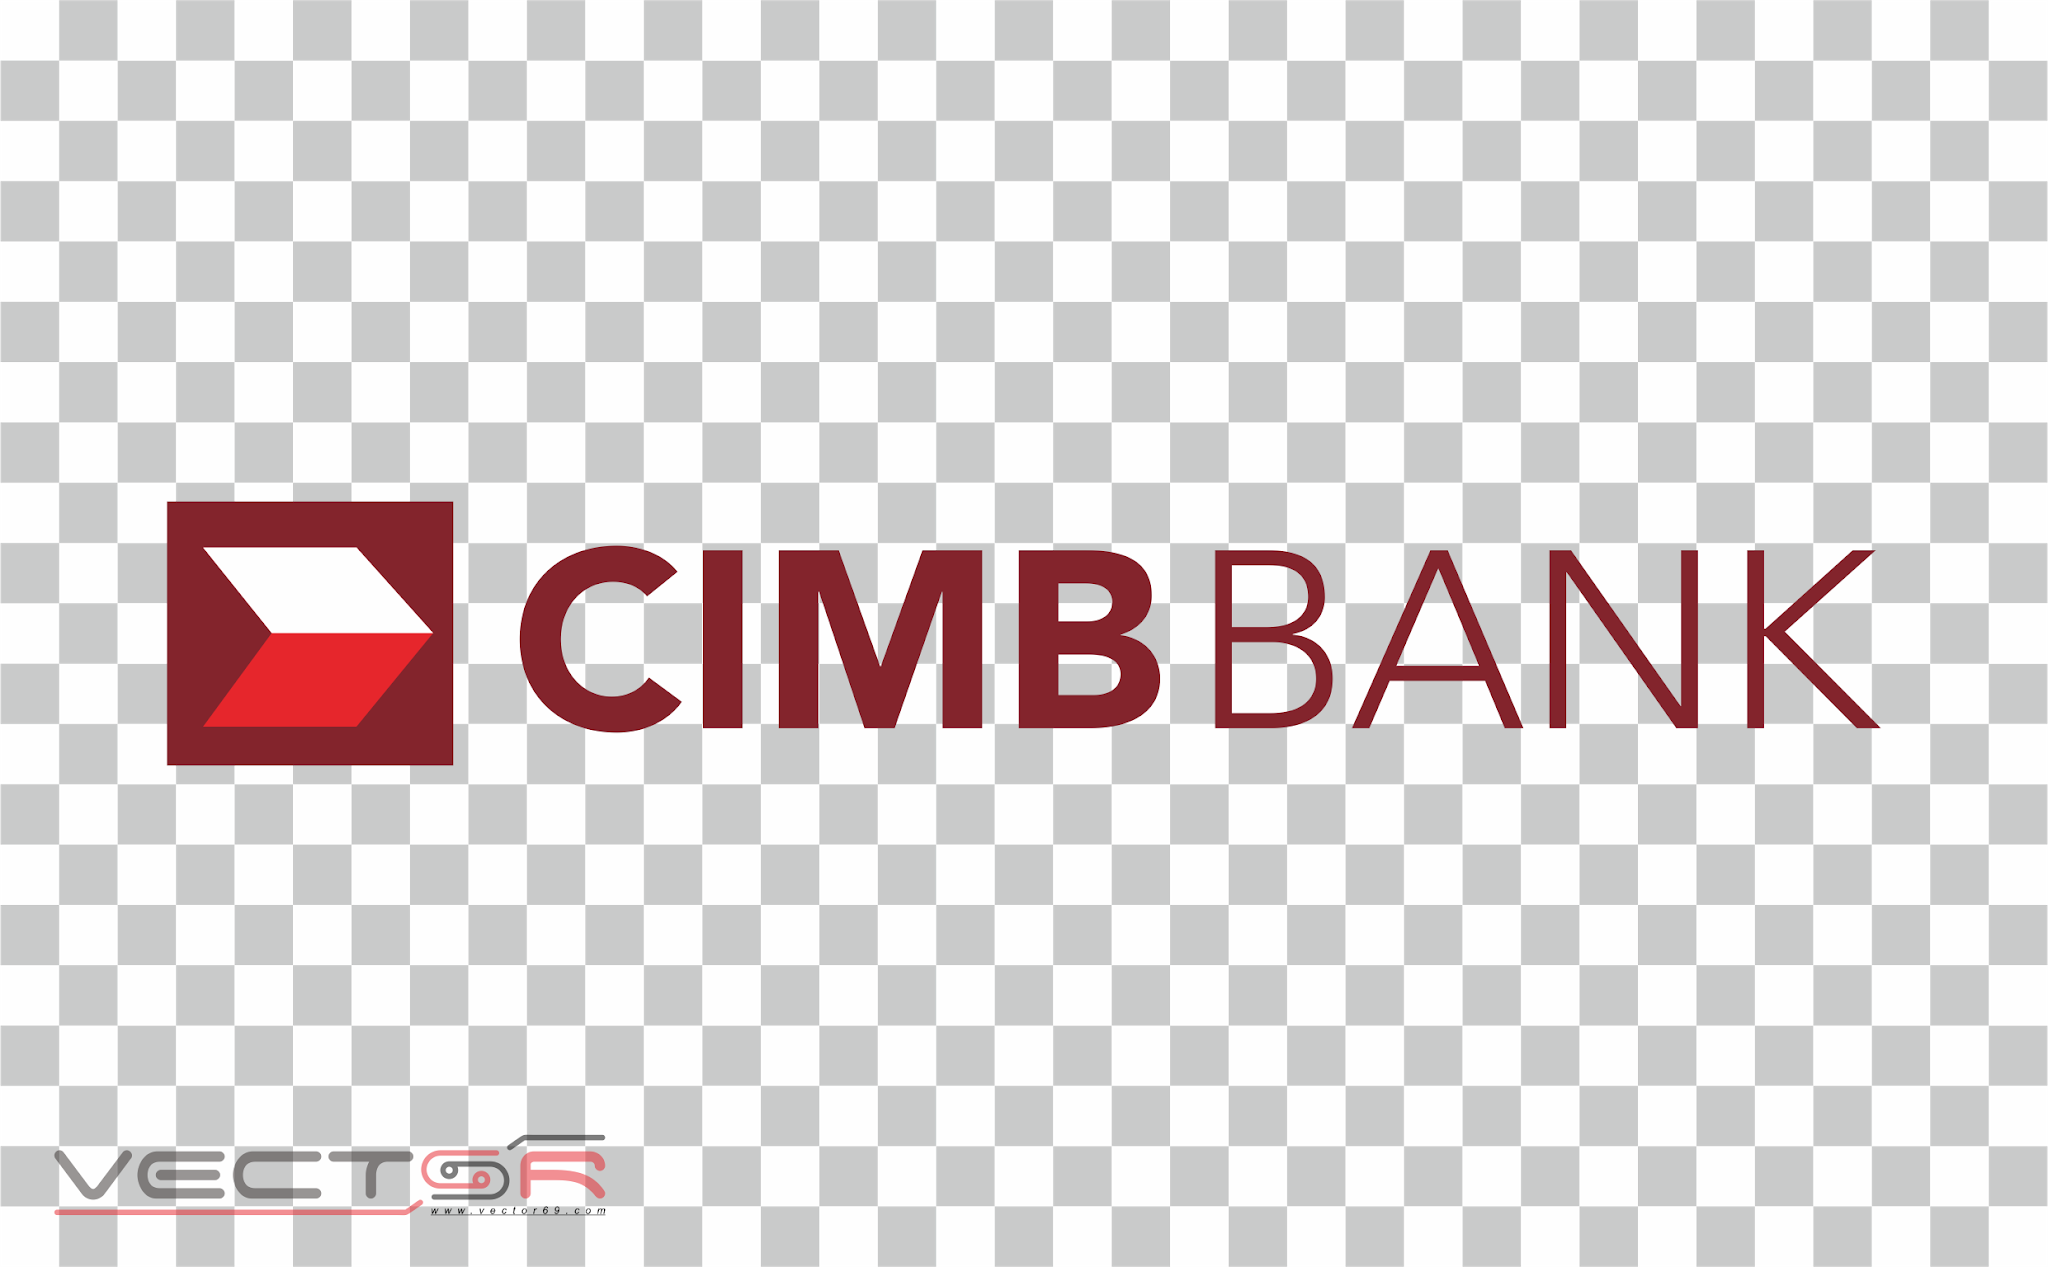 CIMB Bank Logo - Download Vector File PNG (Portable Network Graphics)